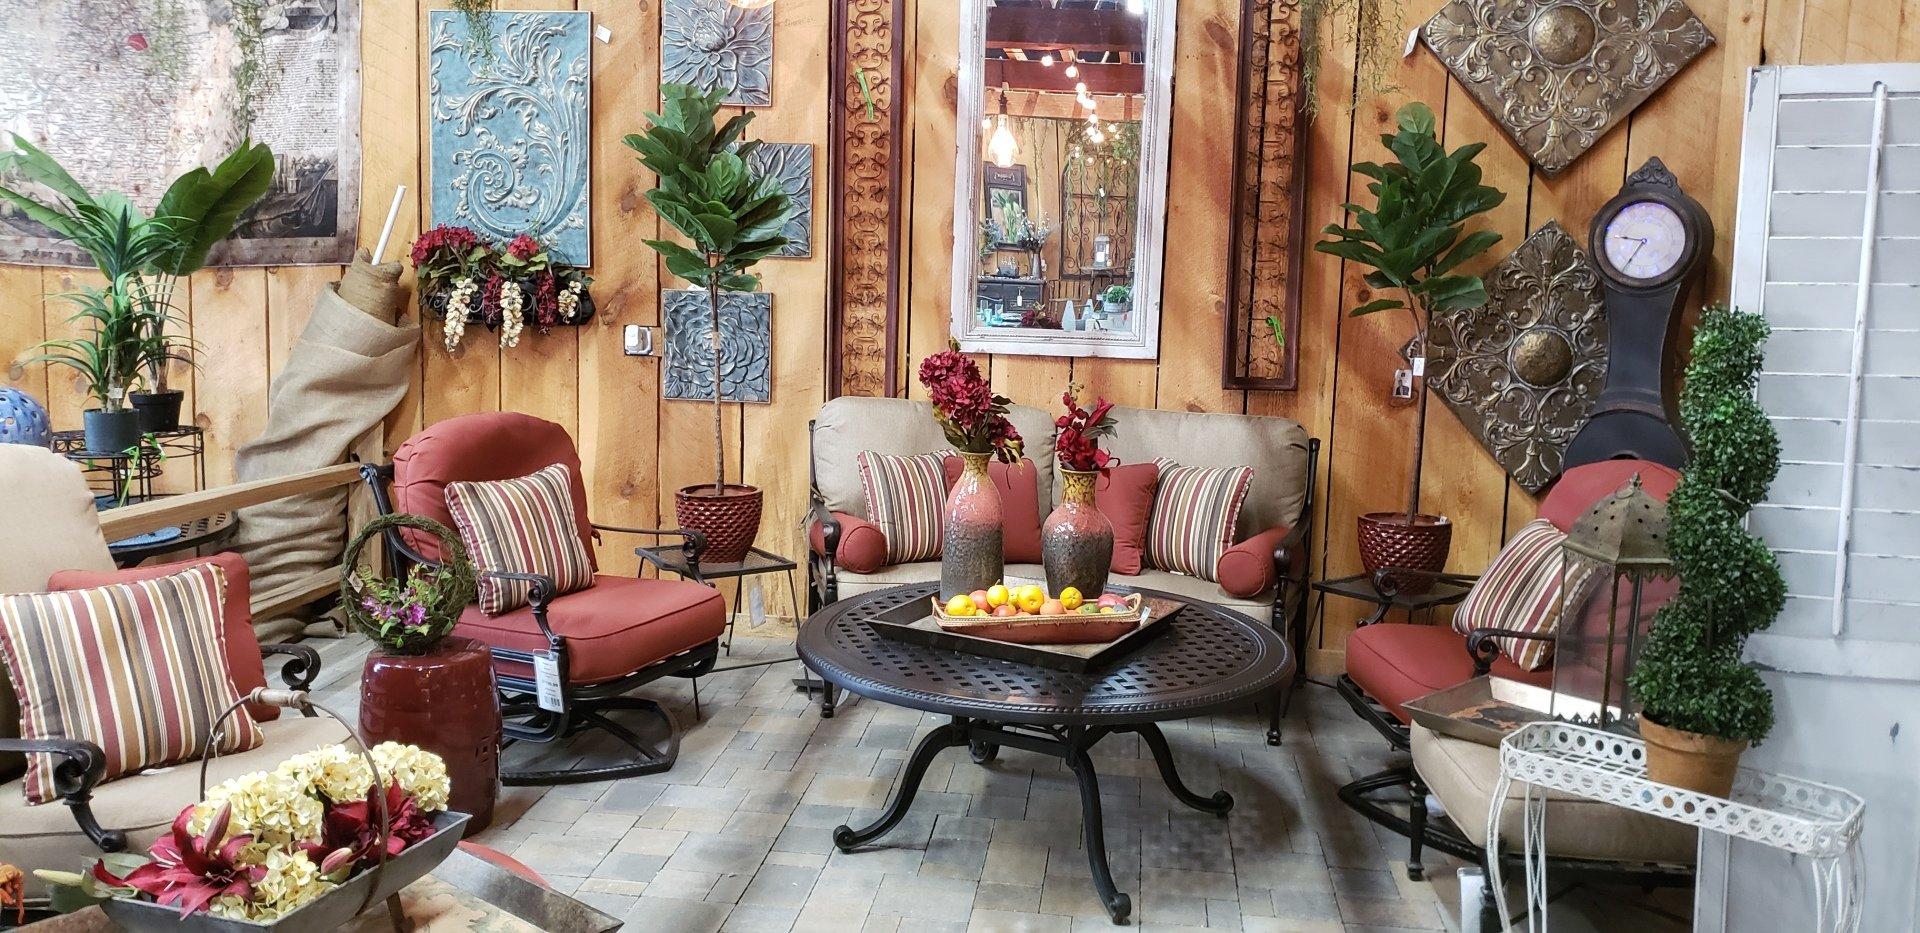 Patio Furniture Amarillo Tx Home Decor Panhandle